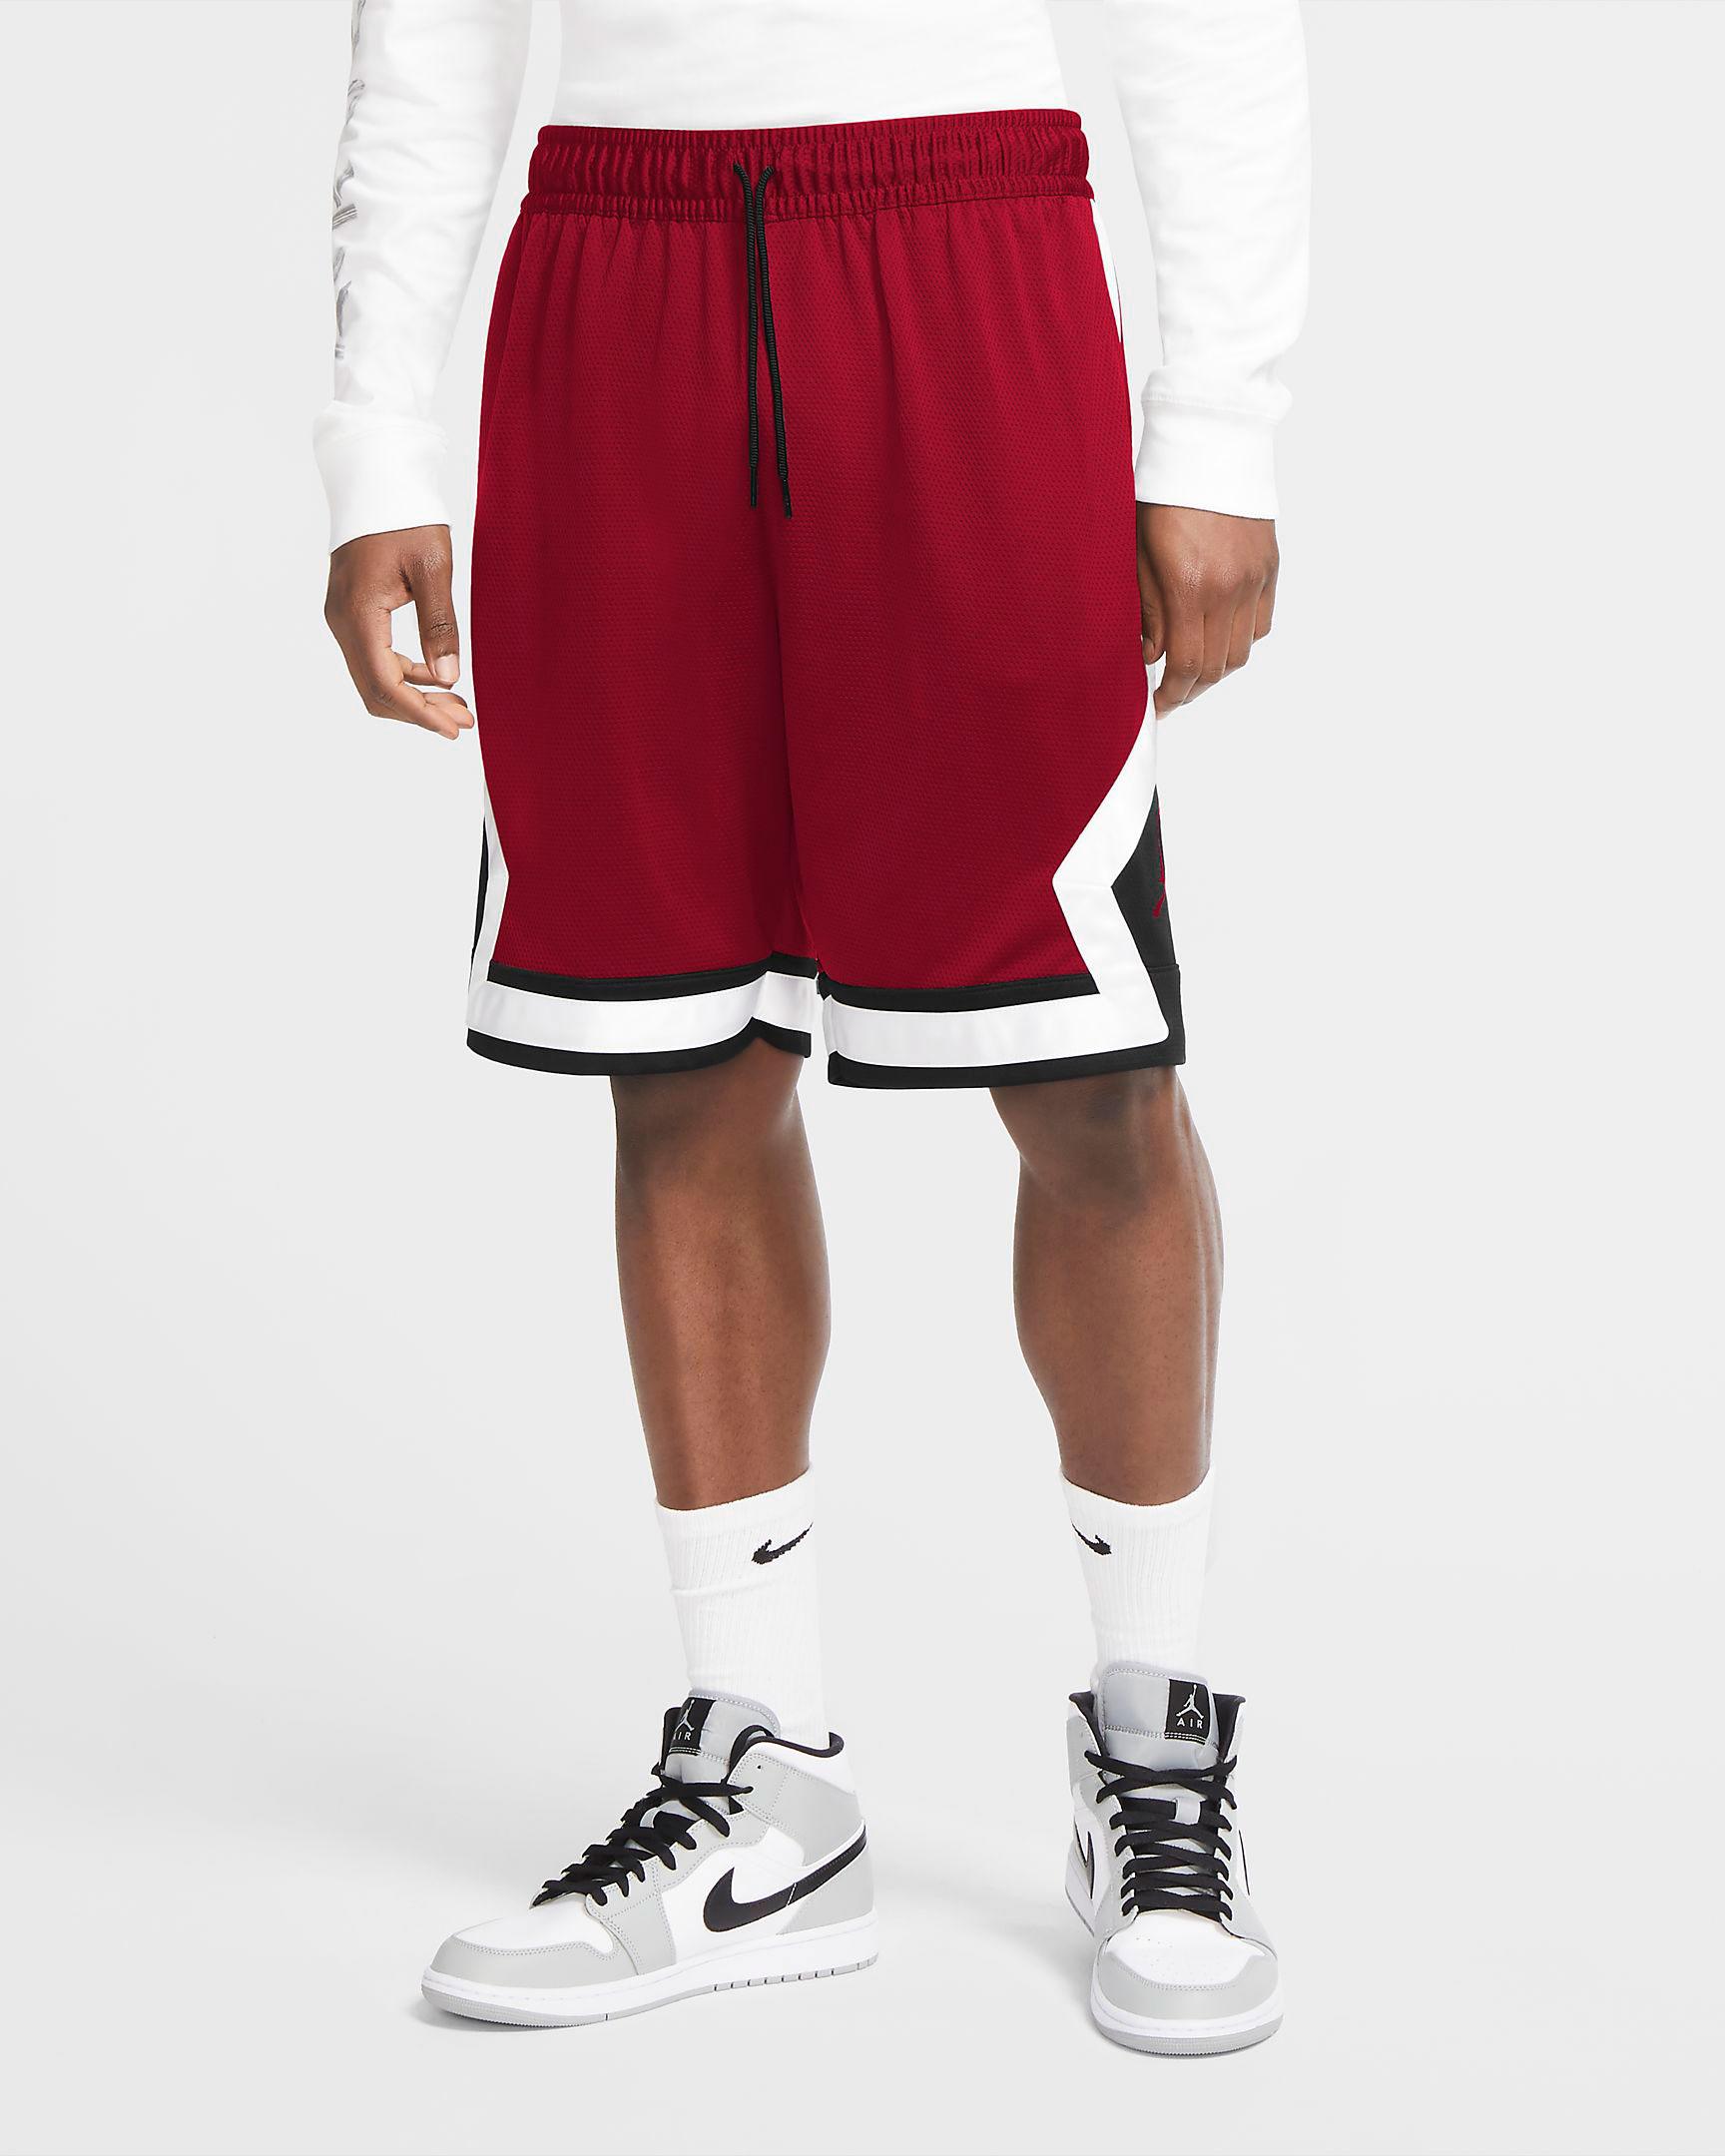 jordan-jumpman-diamond-shorts-gym-red-black-white-1